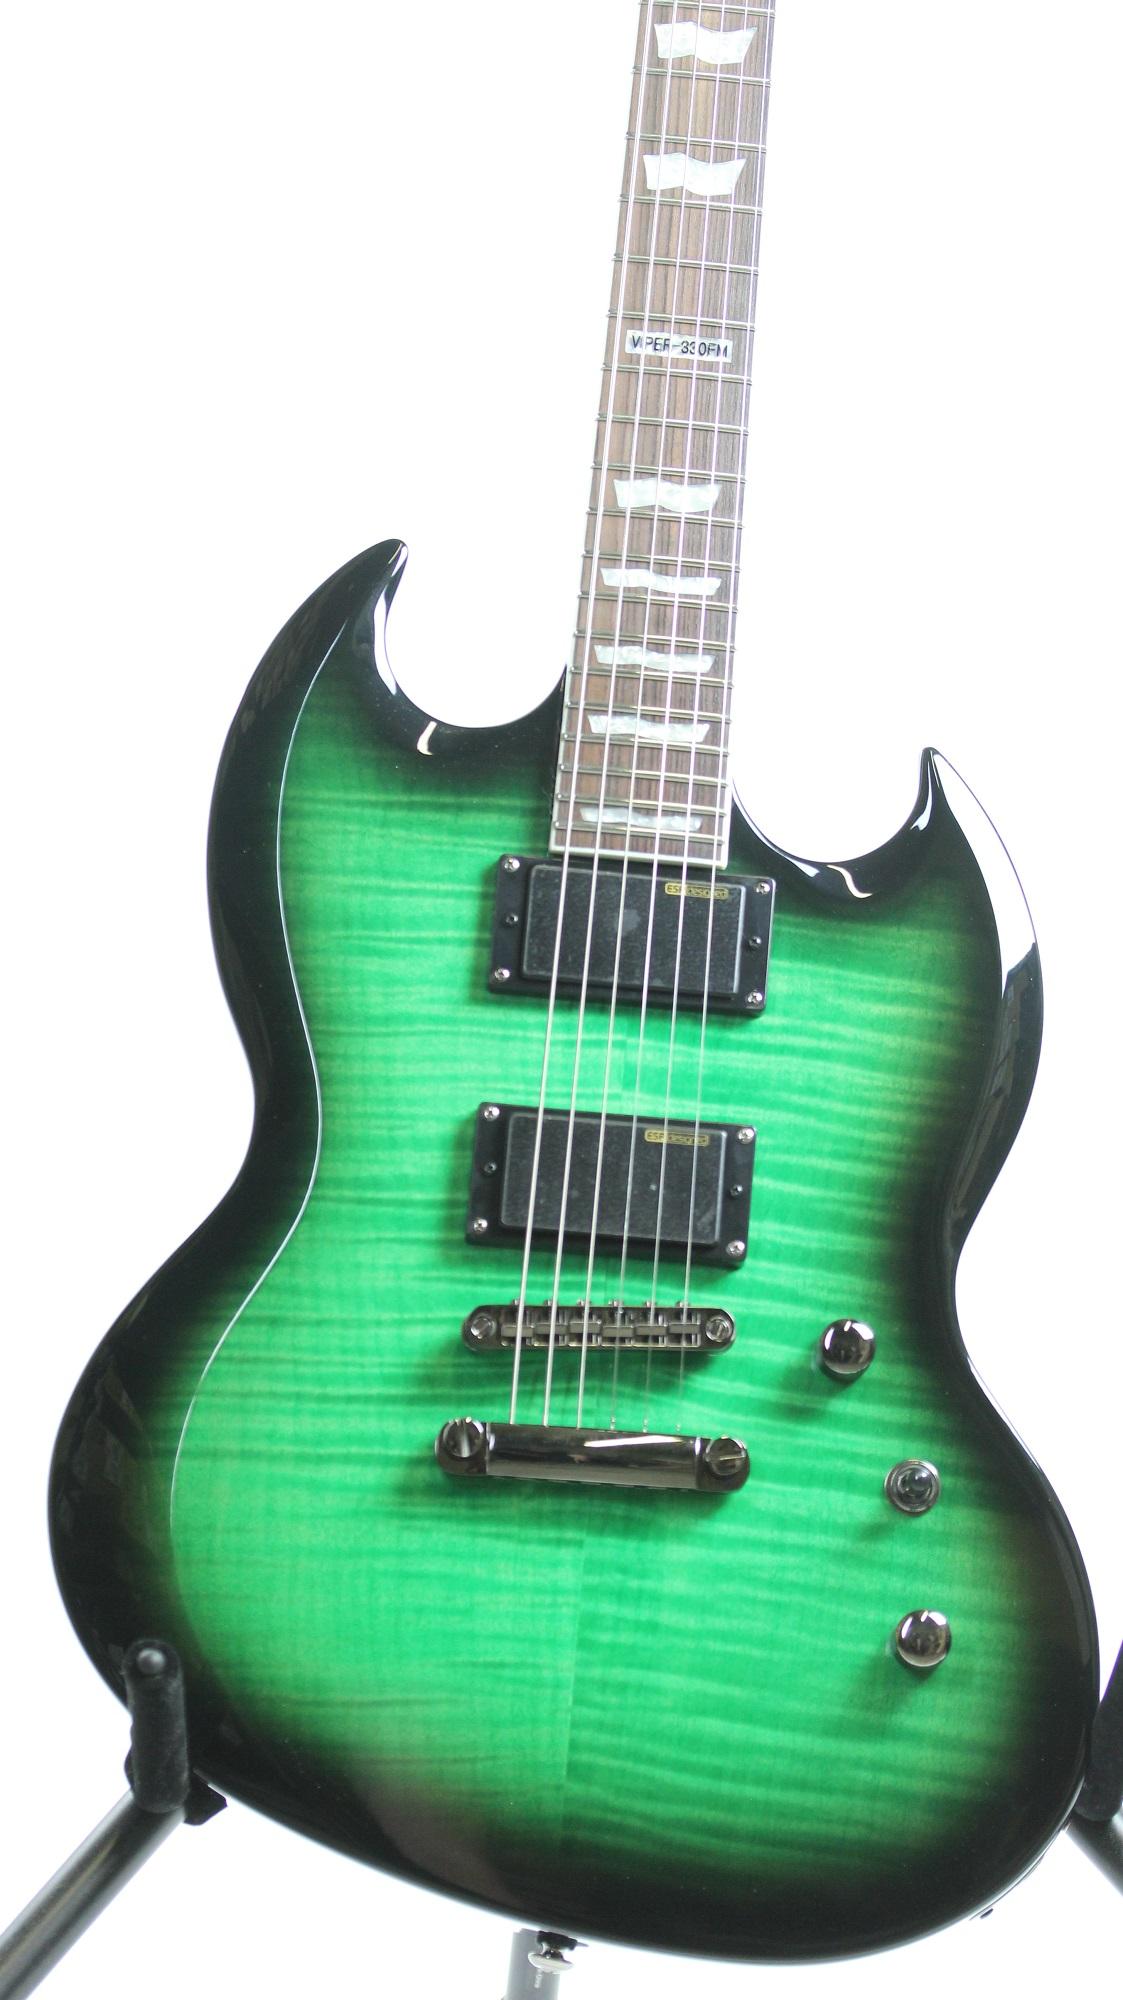 Esp Ltd Viper Fm See Thru Green Sunburst Sampleprototype Electric Guitar on Seymour Duncan Guitar Pickups